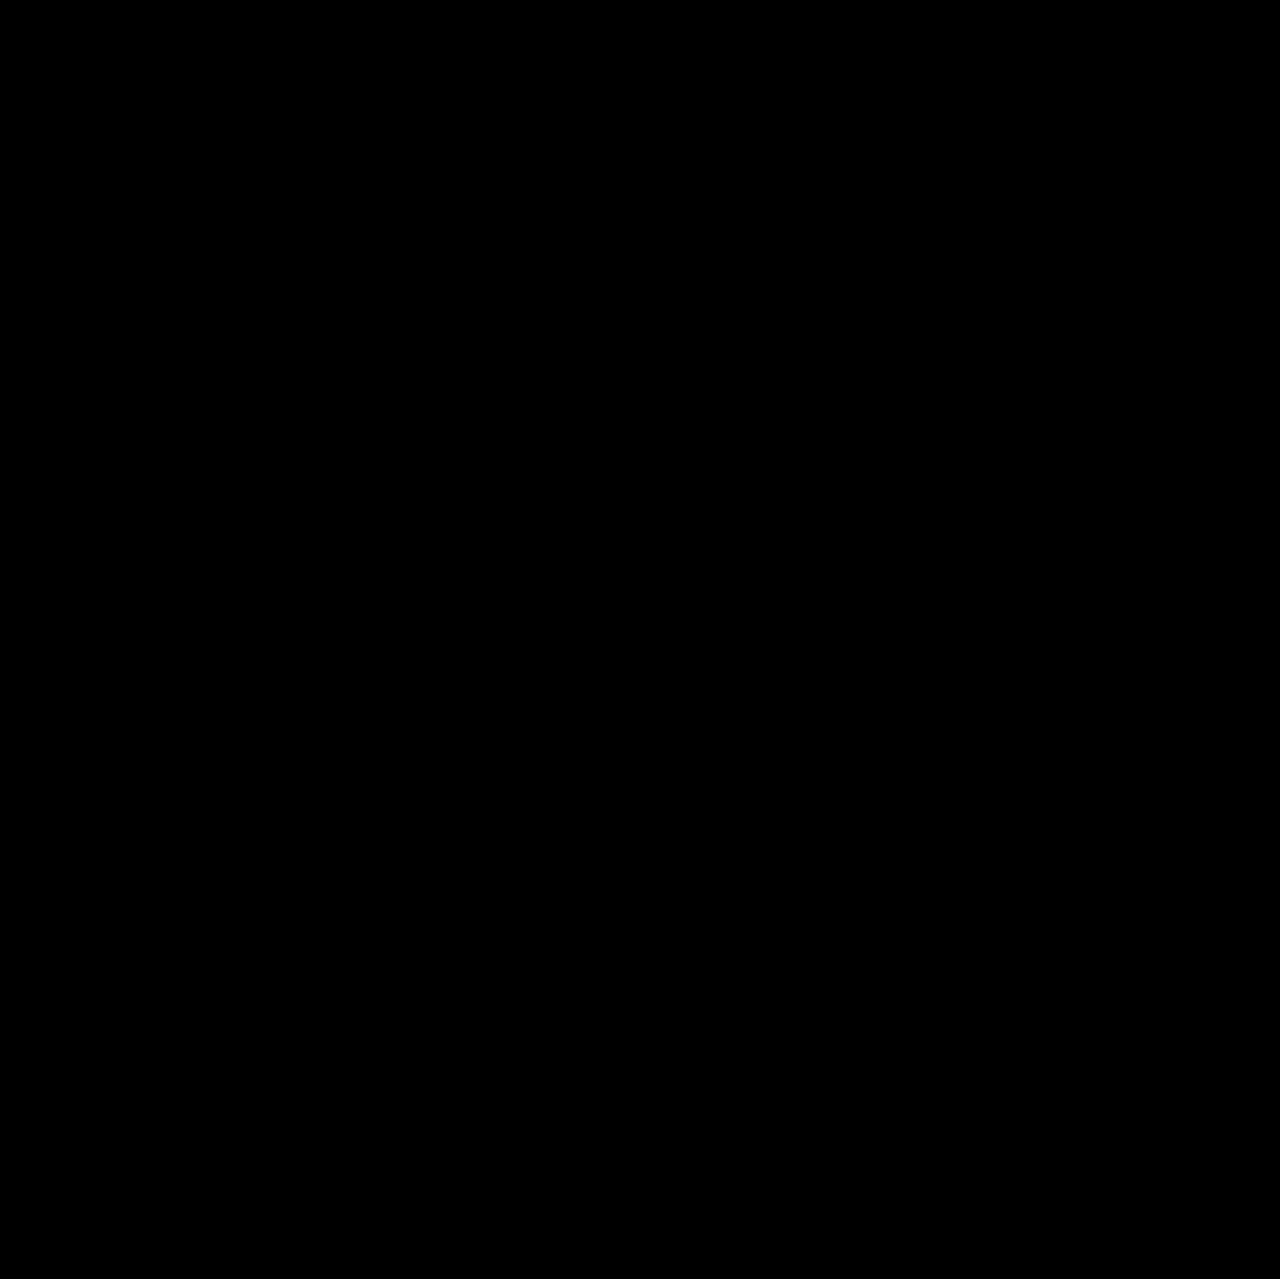 Chicco Esterilizador Electrico de Vapor Sterilnatural 2 en 1